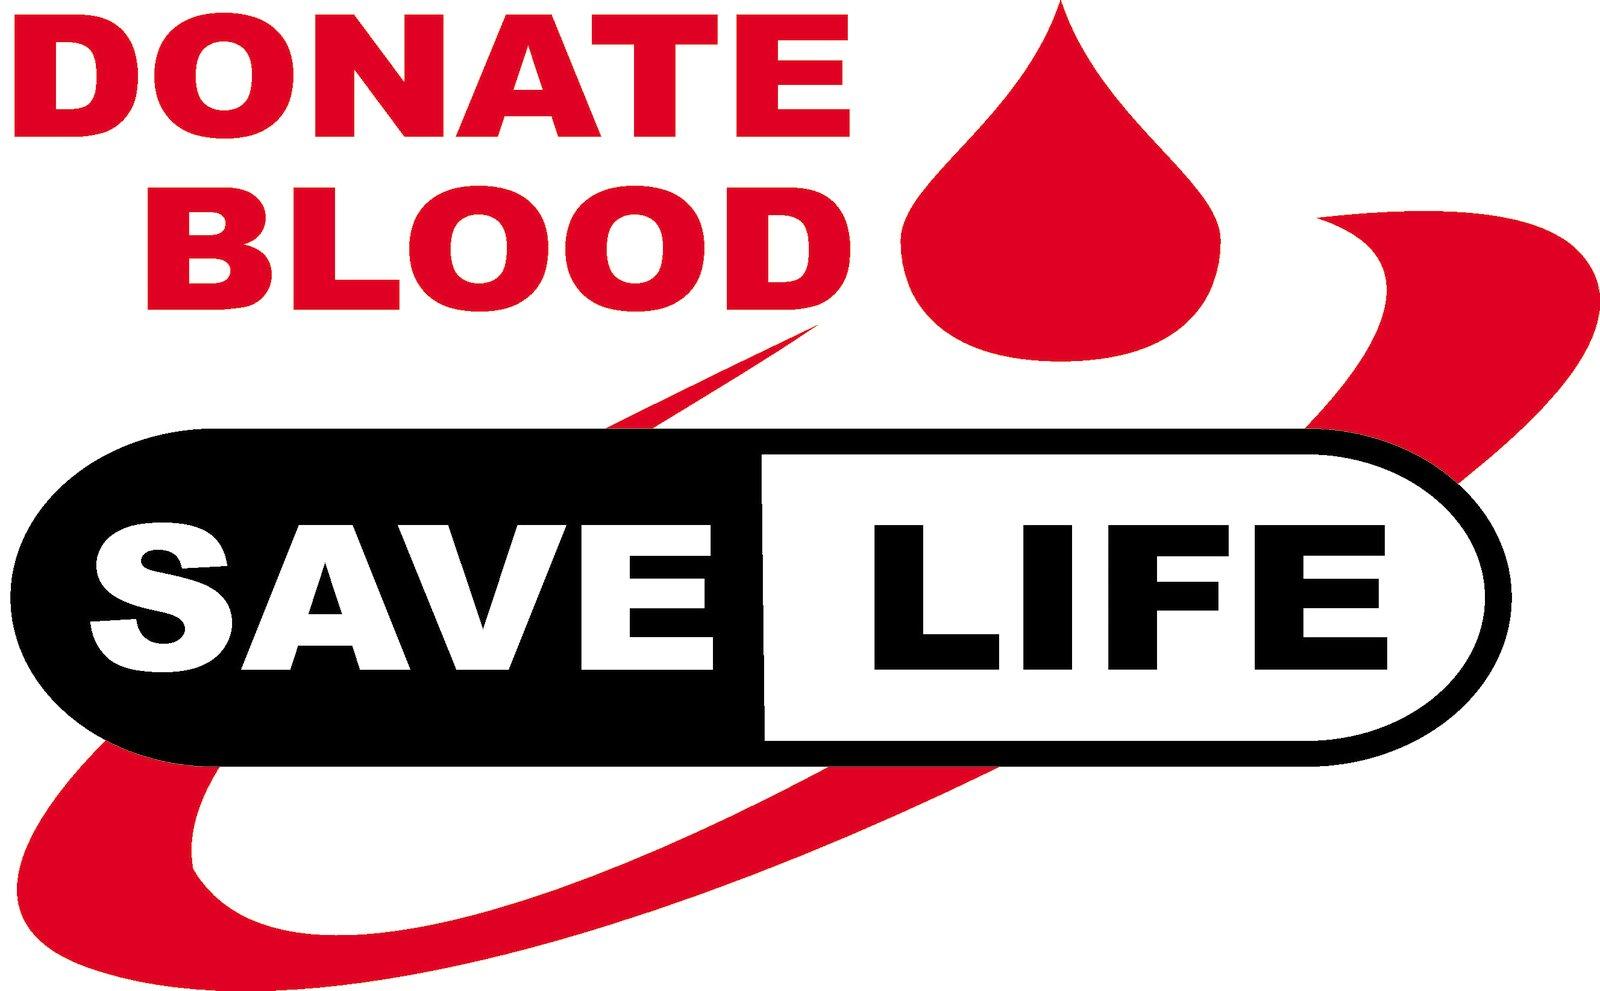 Red Cross clipart logo Cross the Blood  Cross